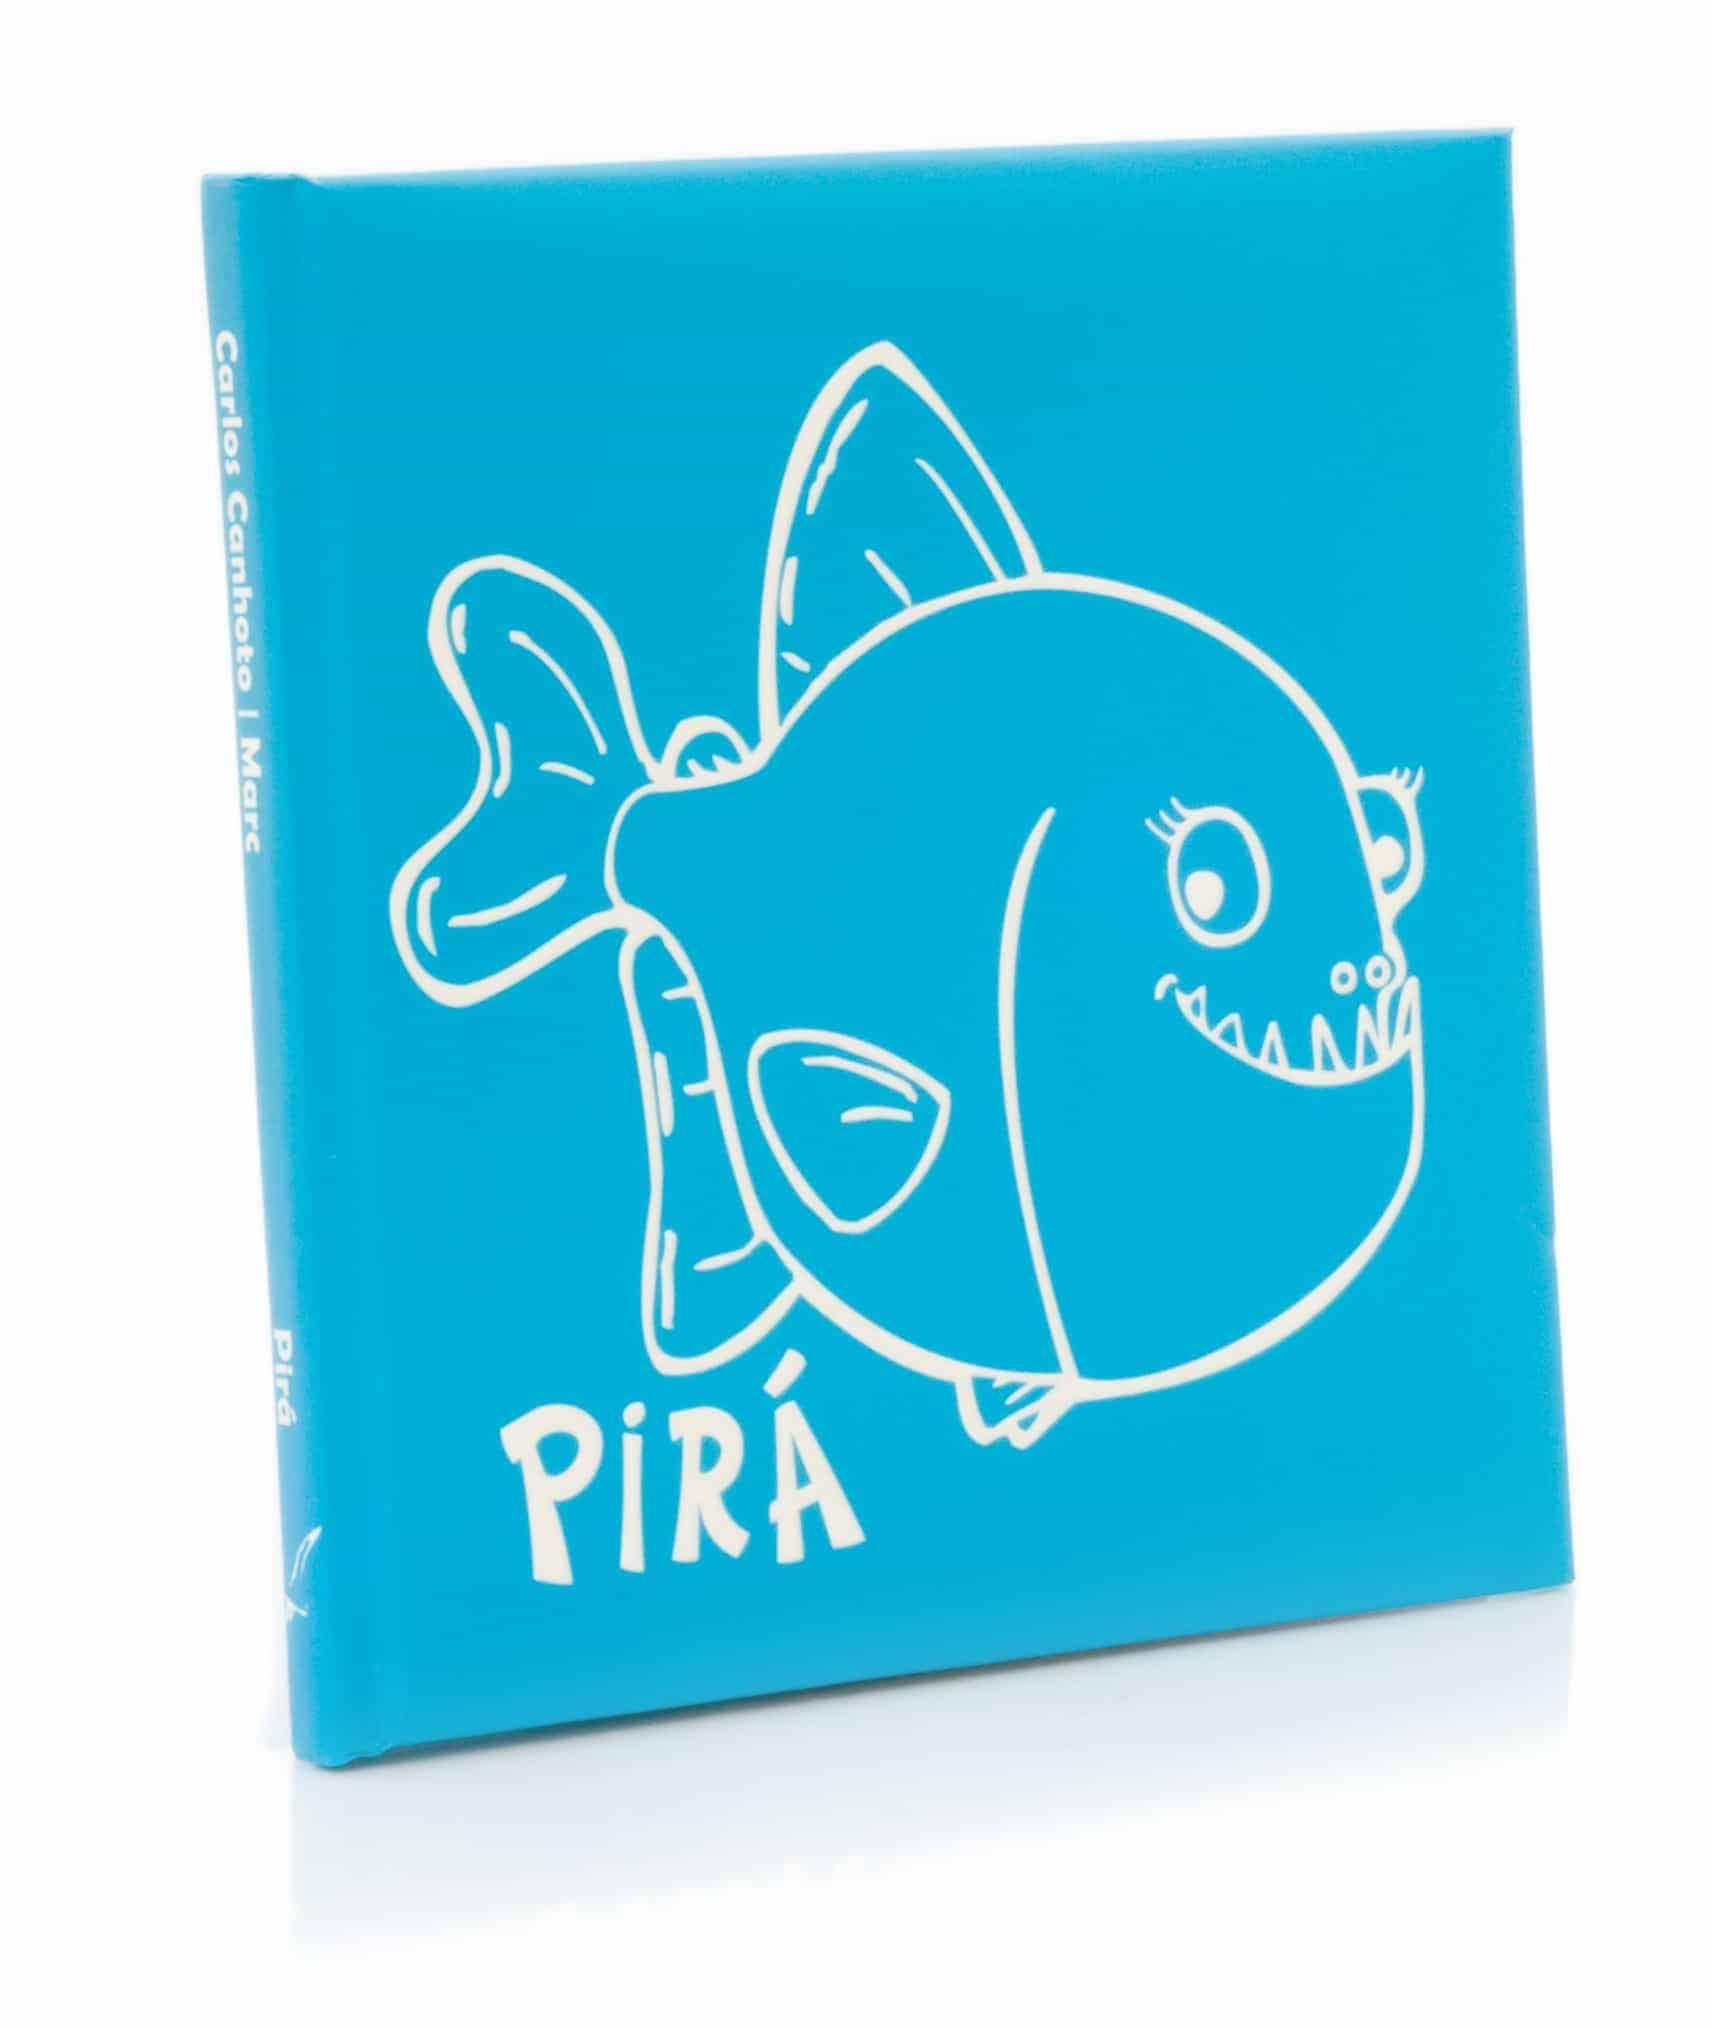 Recursos didácticos para a Pirá